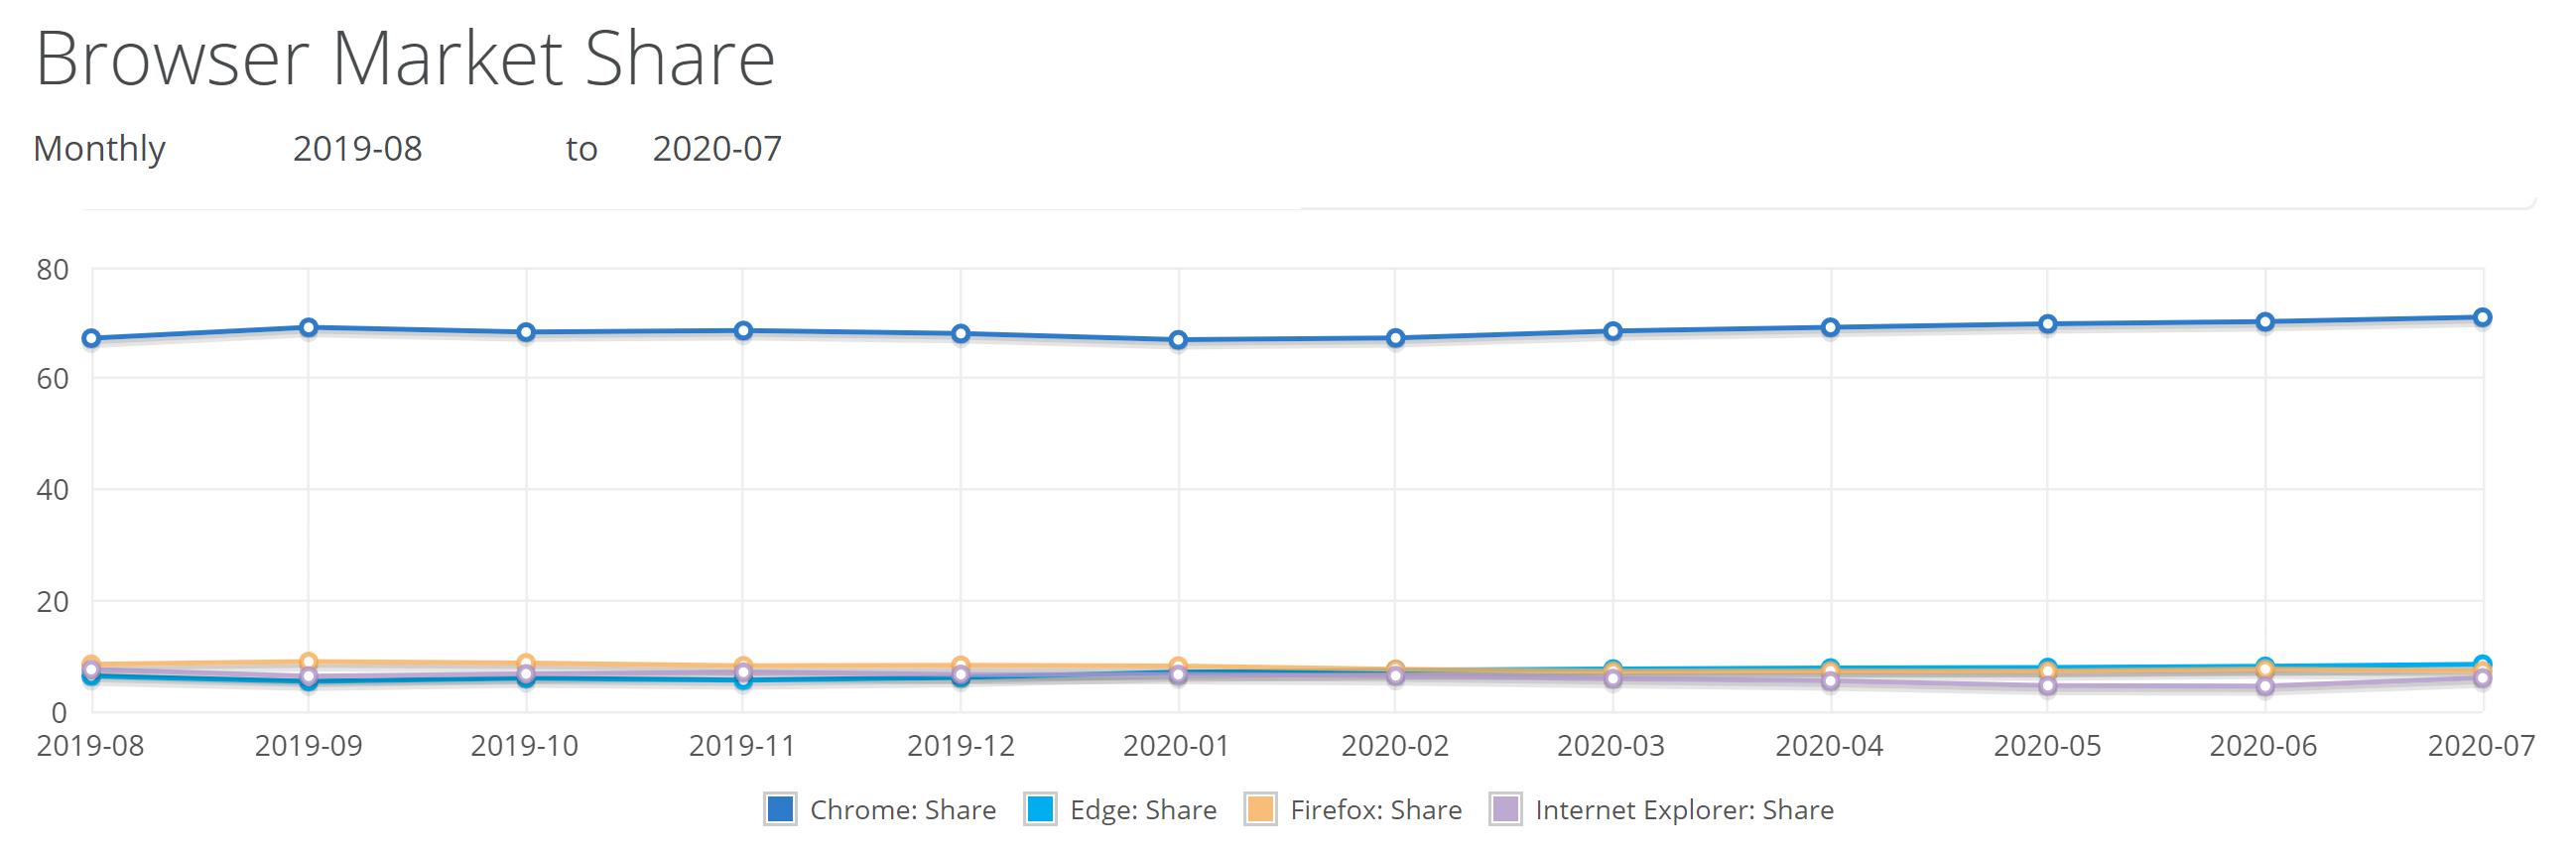 browser-marketshare-july-2020